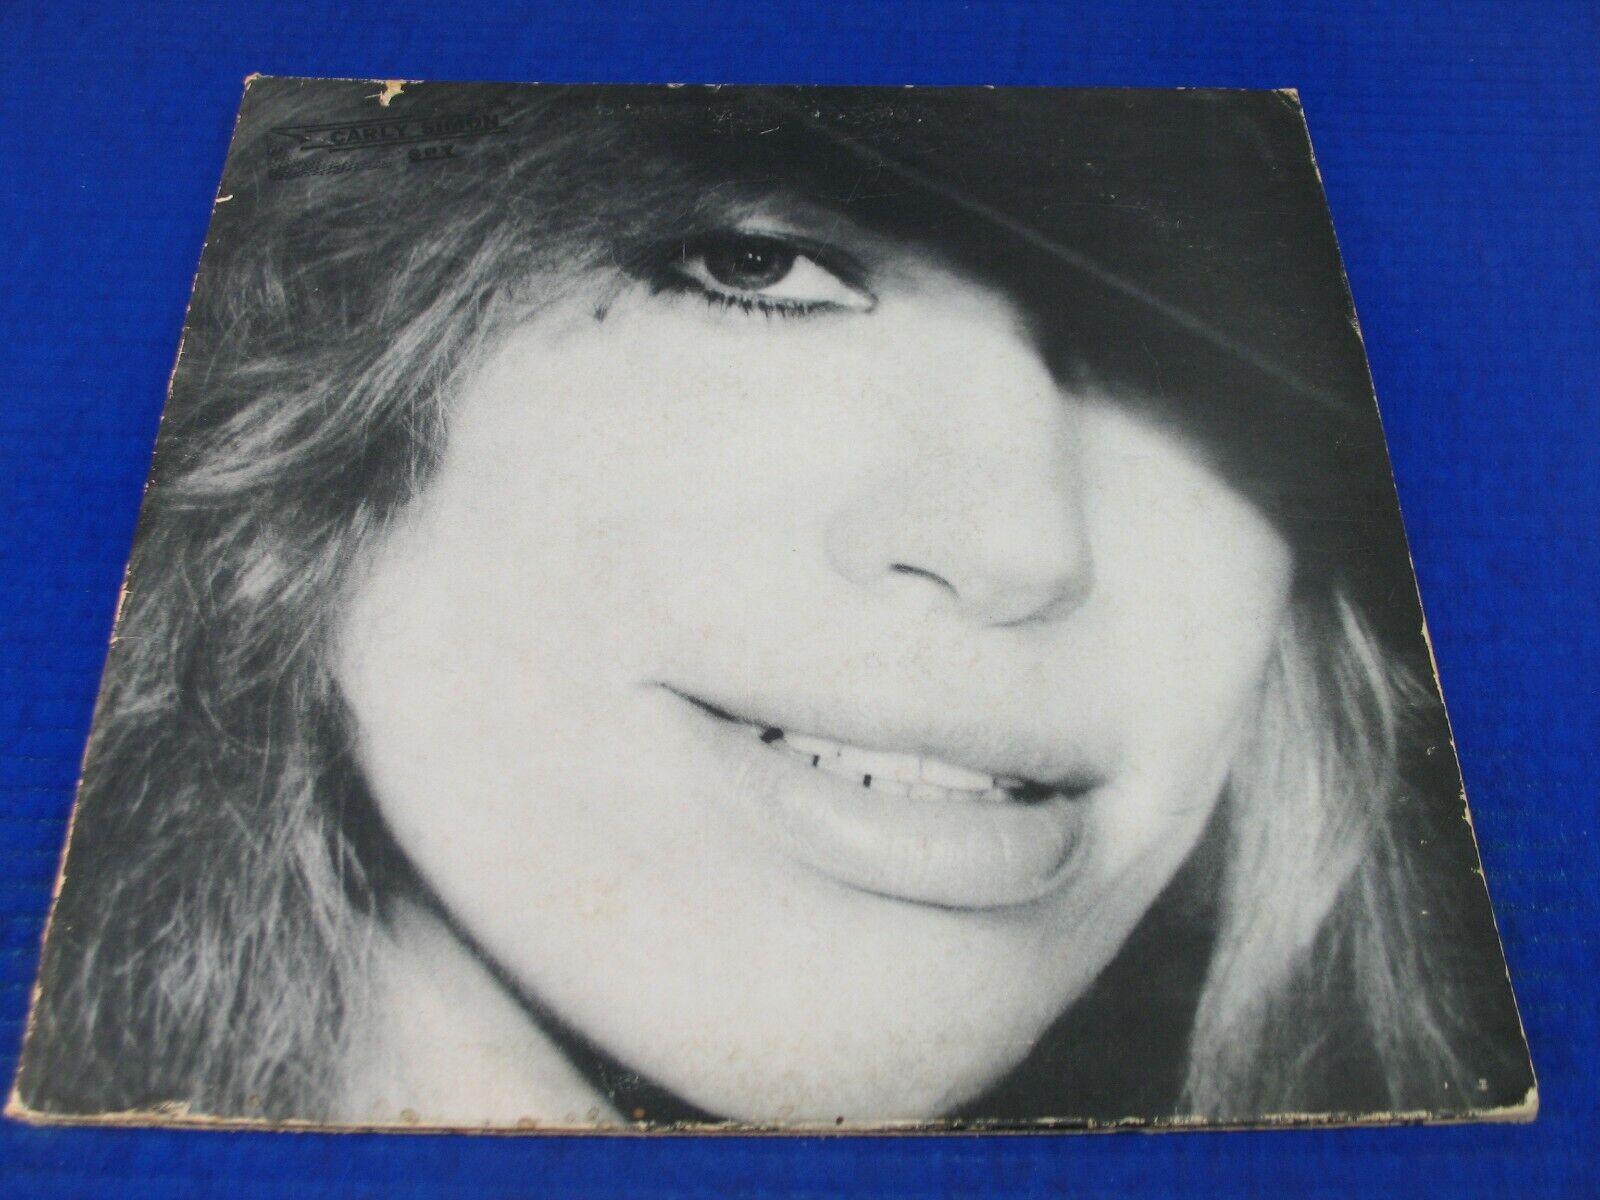 Carly Simon - Spy - 1979 Rock LP VG VINYL Record - $1.99